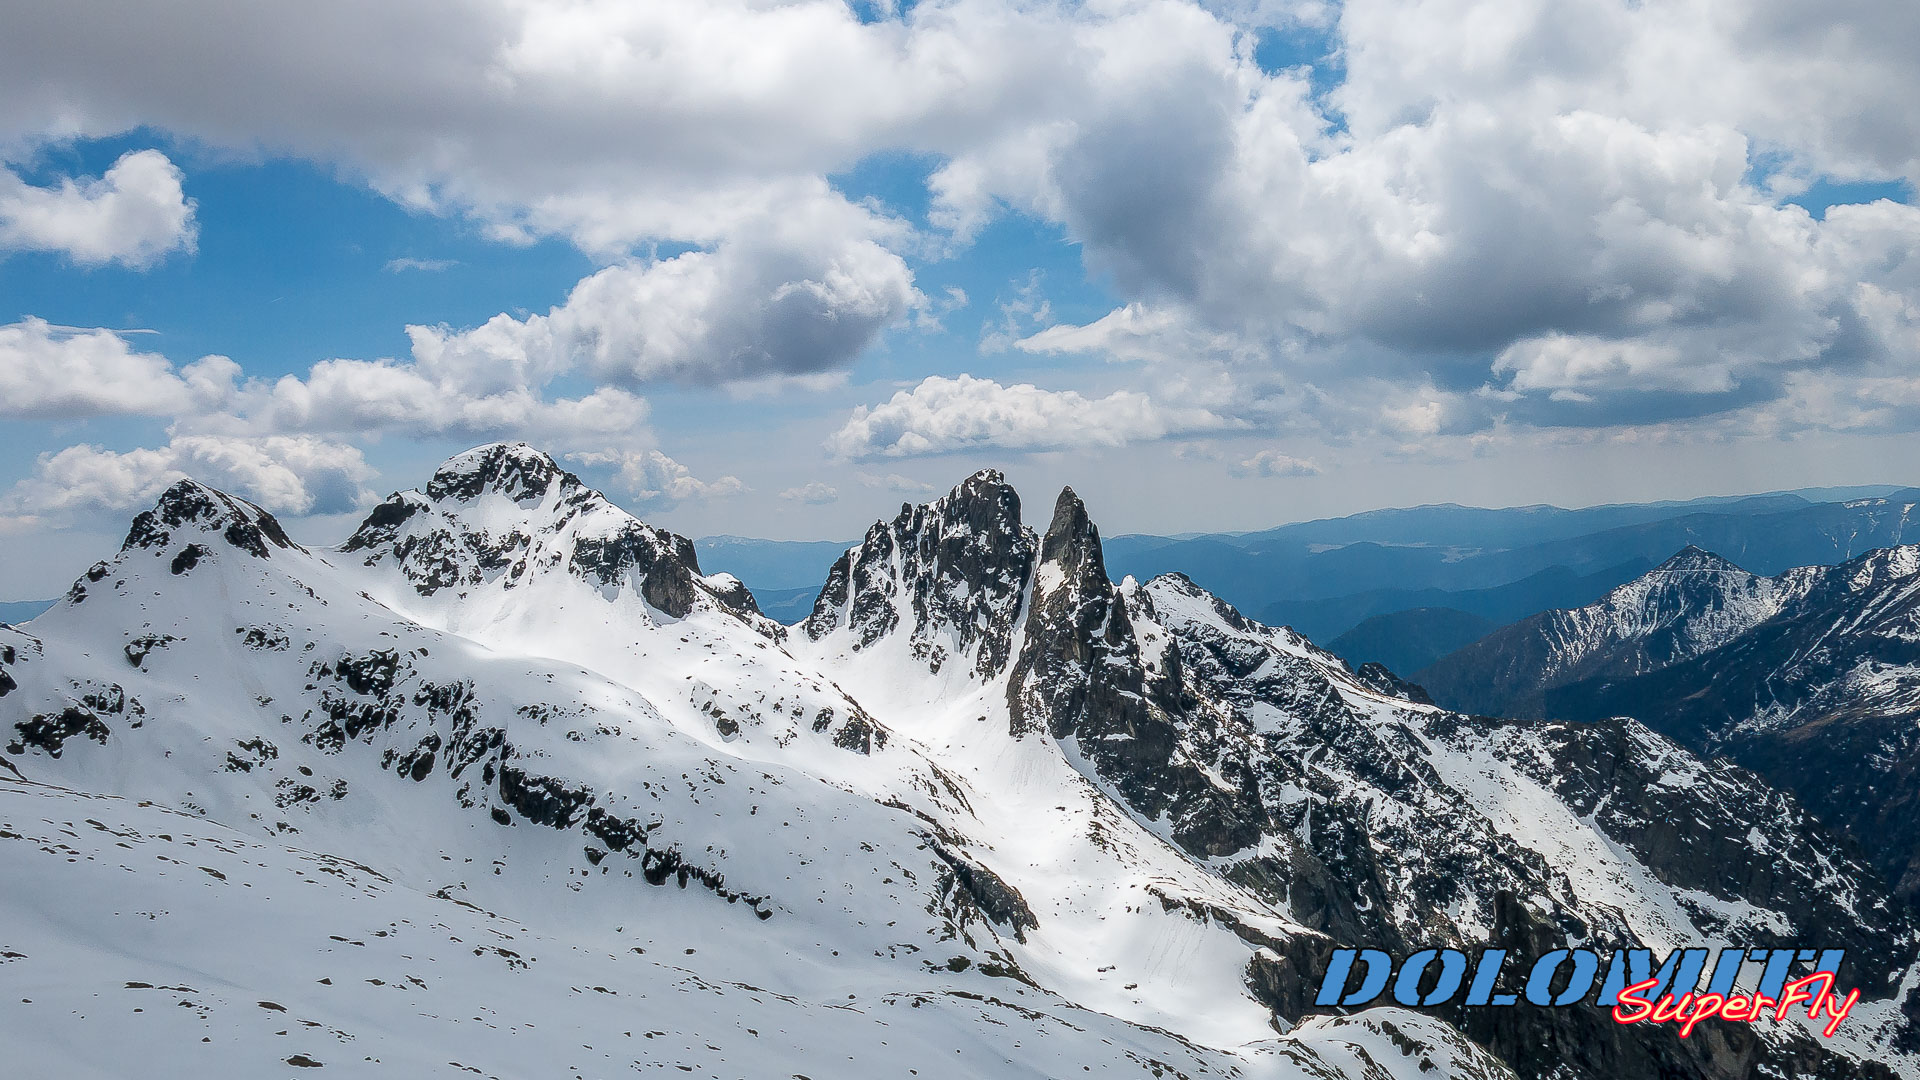 """Dolomiti Super Fly"""